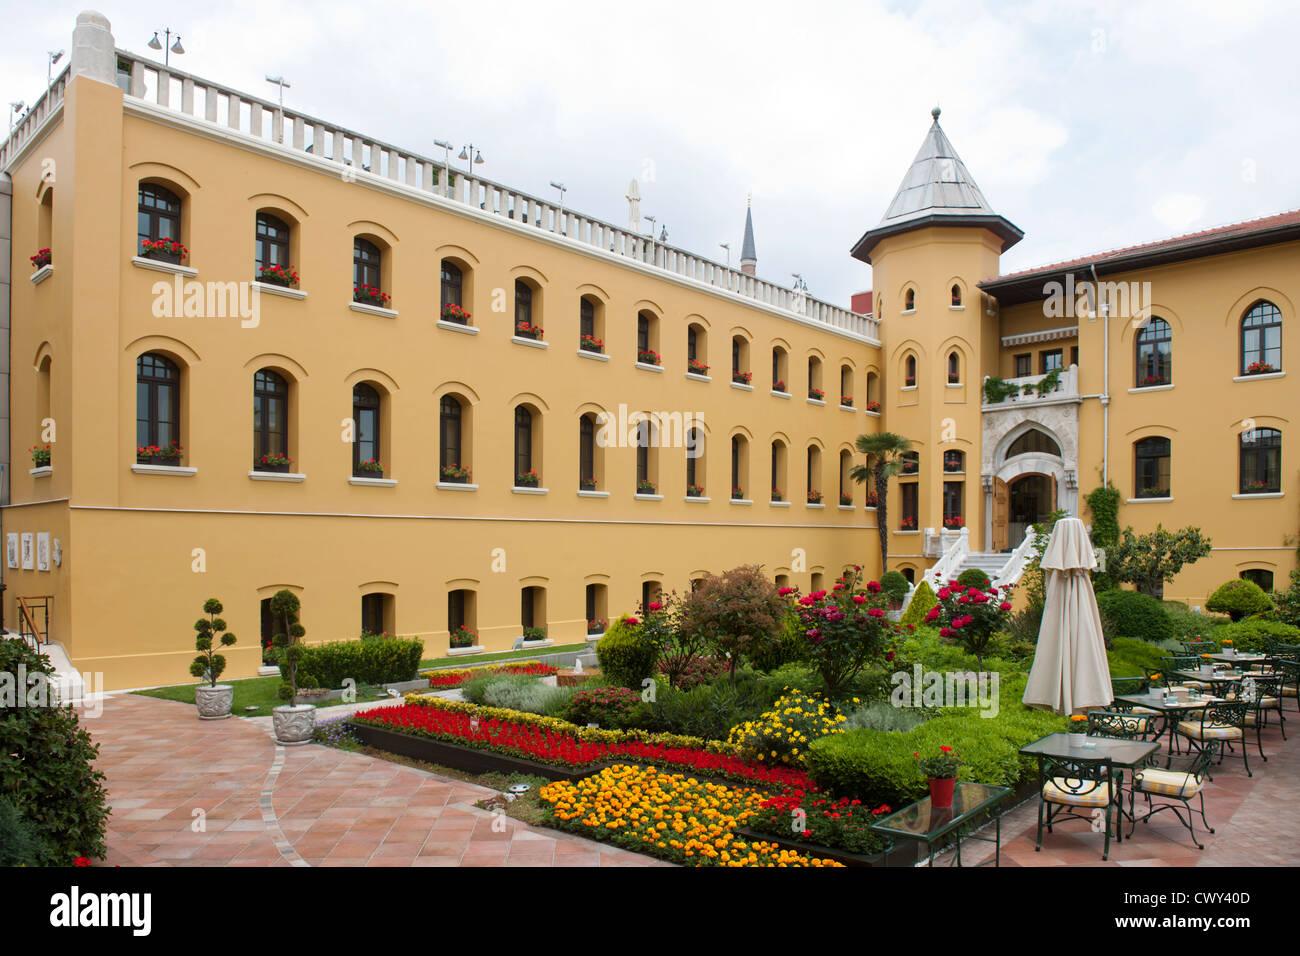 Türkei, Istanbul, Sultanahmet, Four Seasons Hotel Sultanahmet im Gebäude des ehemaligen Gefängnisses - Stock Image